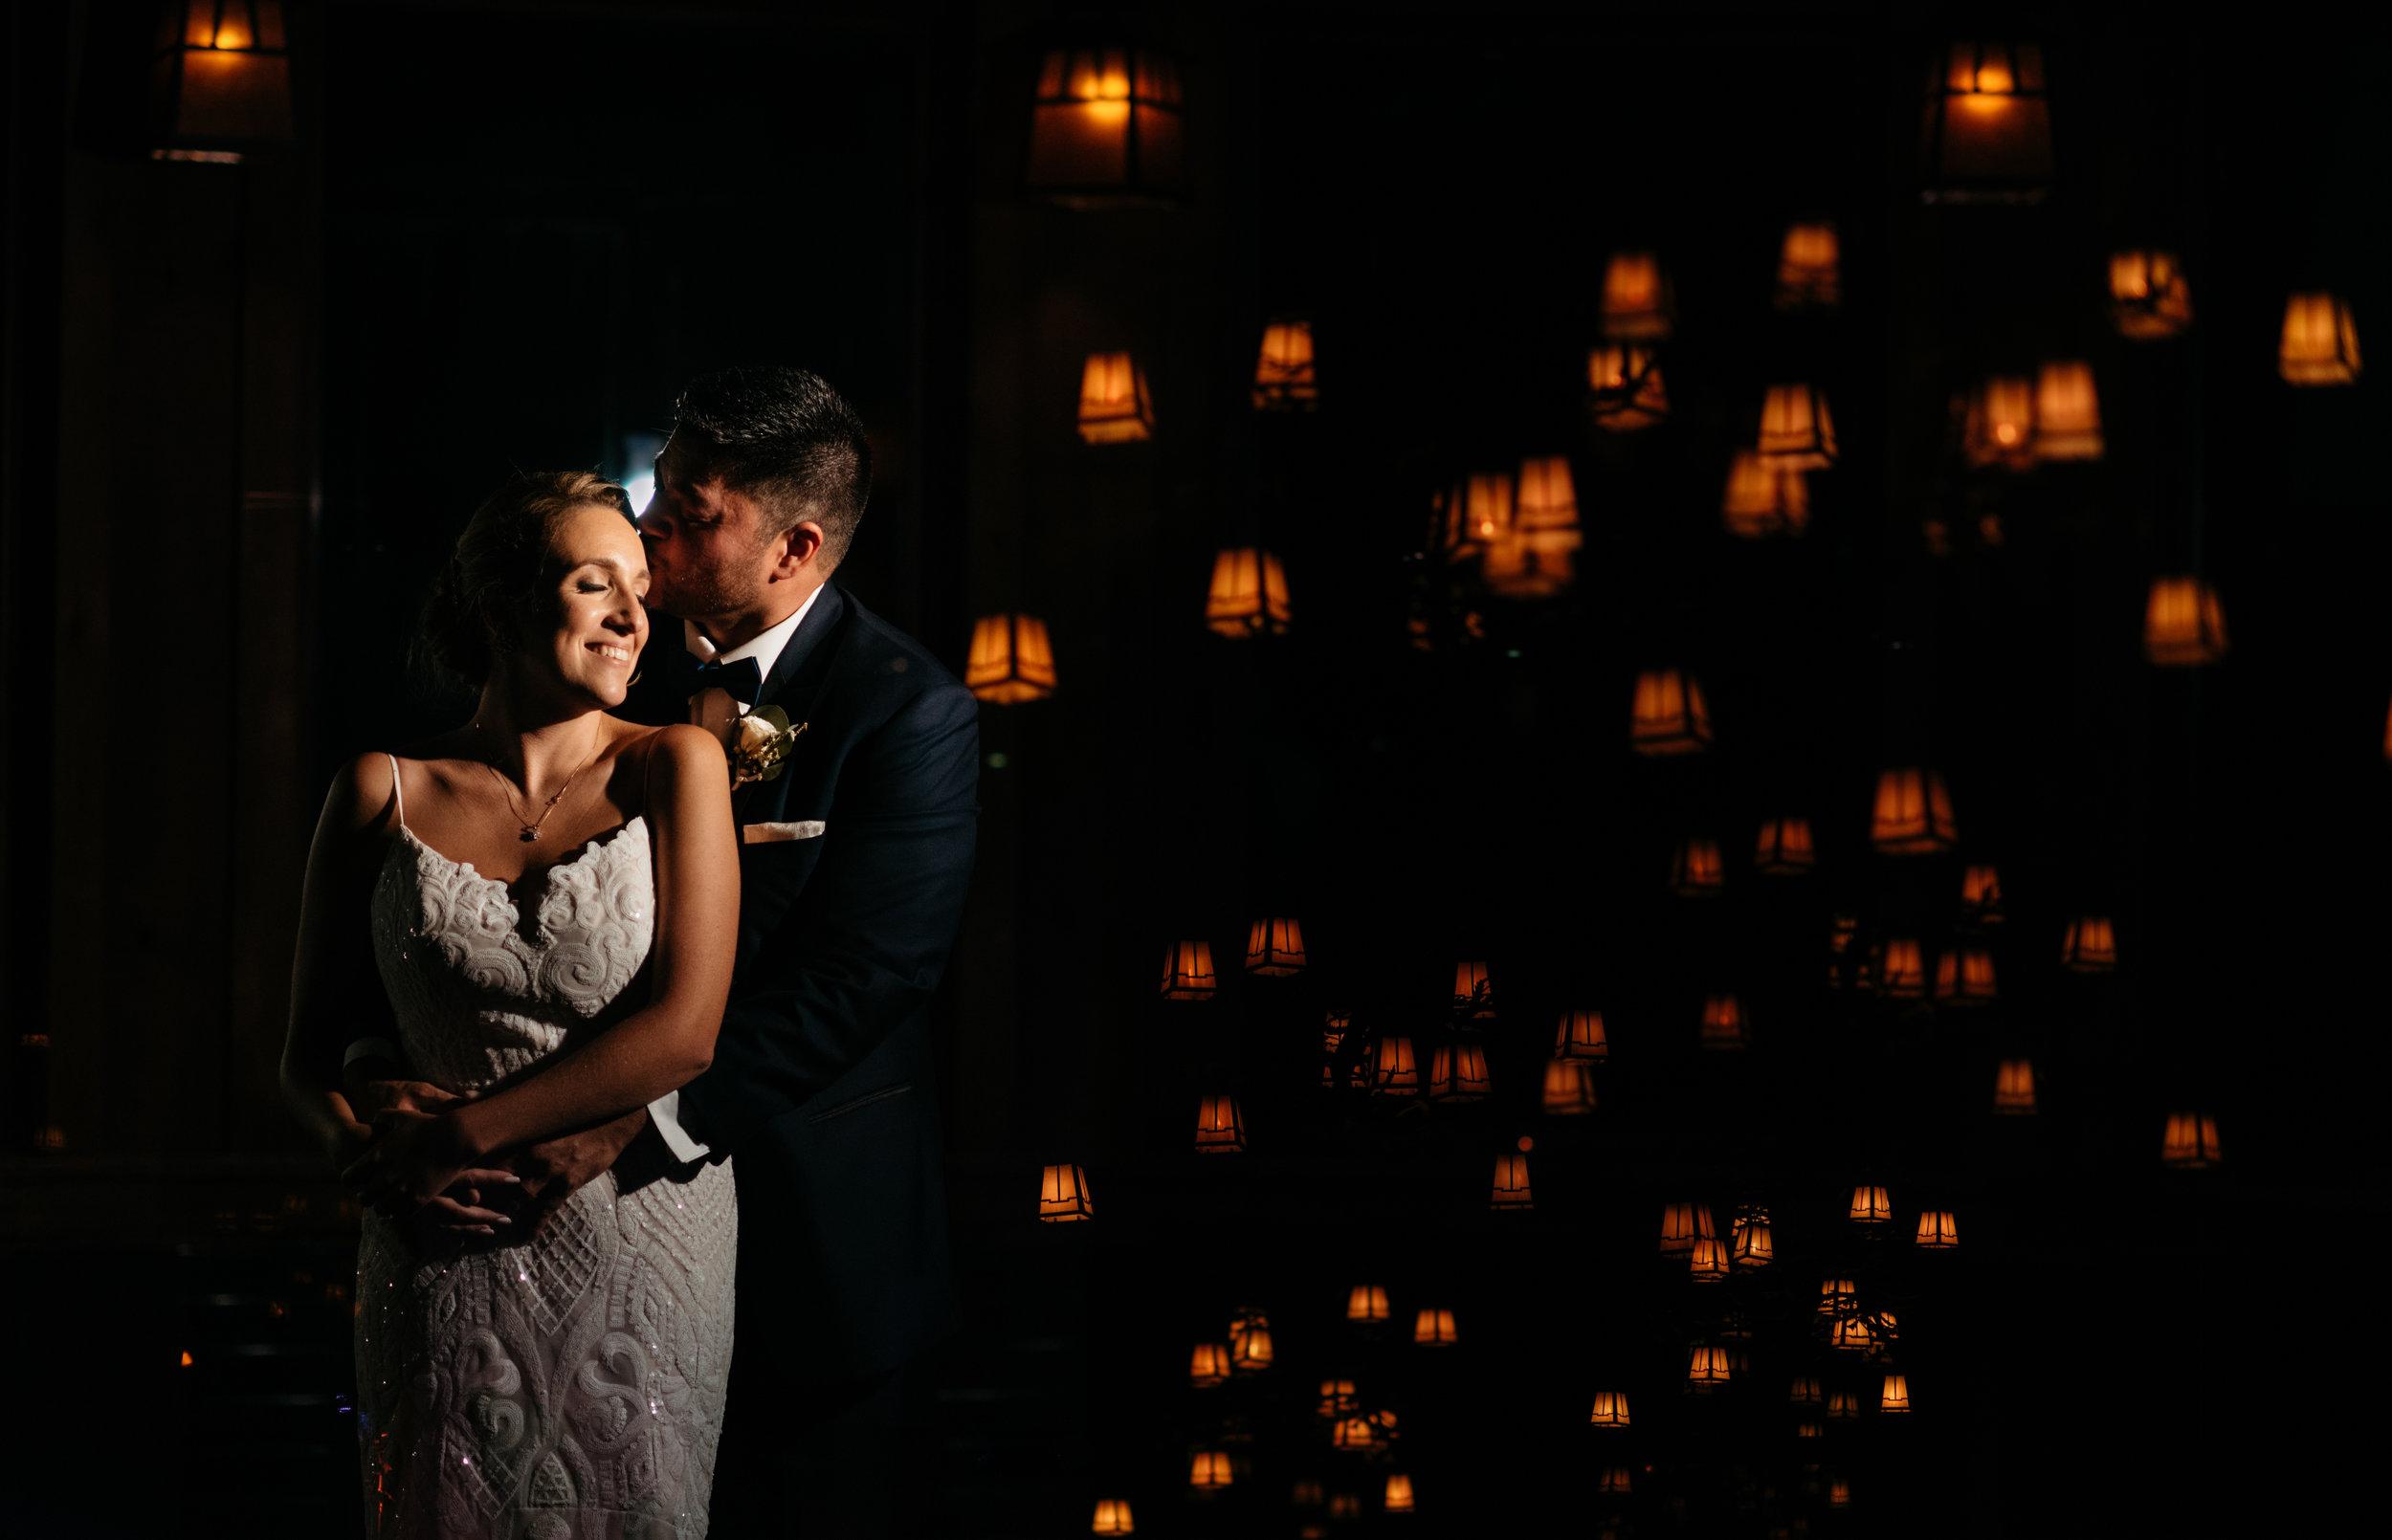 WeddingPhotos | NJPhotographer | Highlights-16-2.jpg